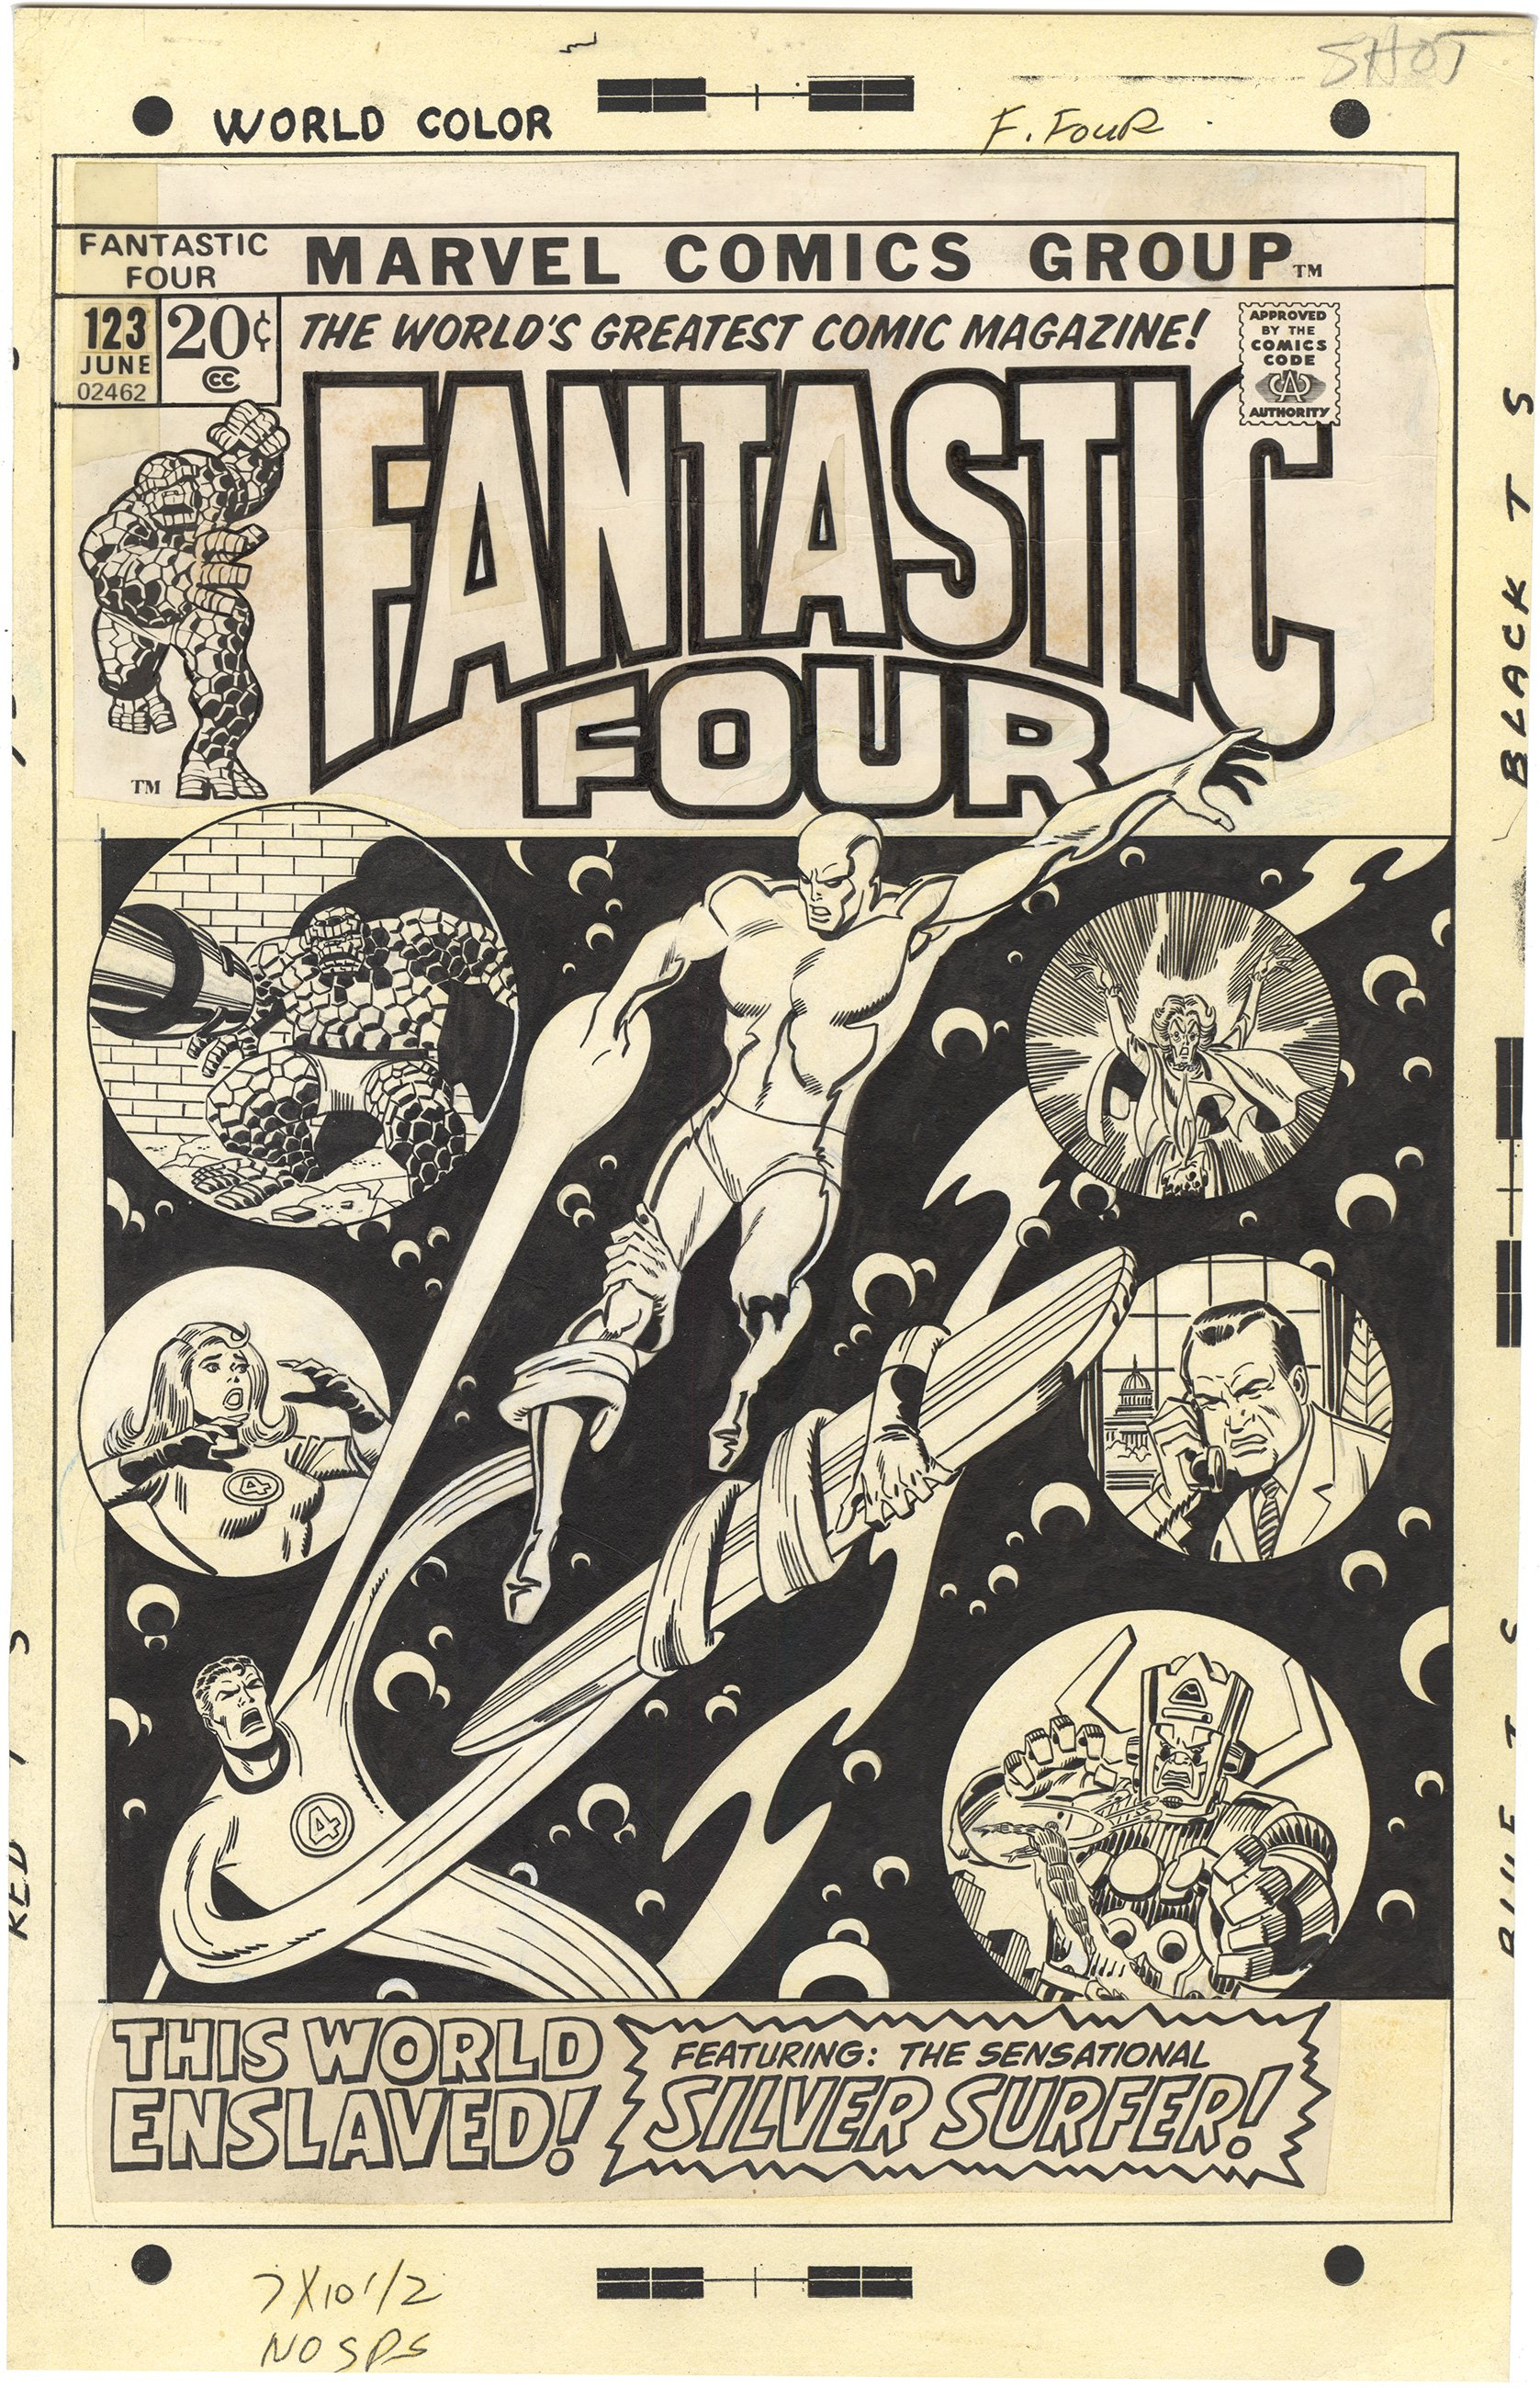 Fantastic Four #123 Cover